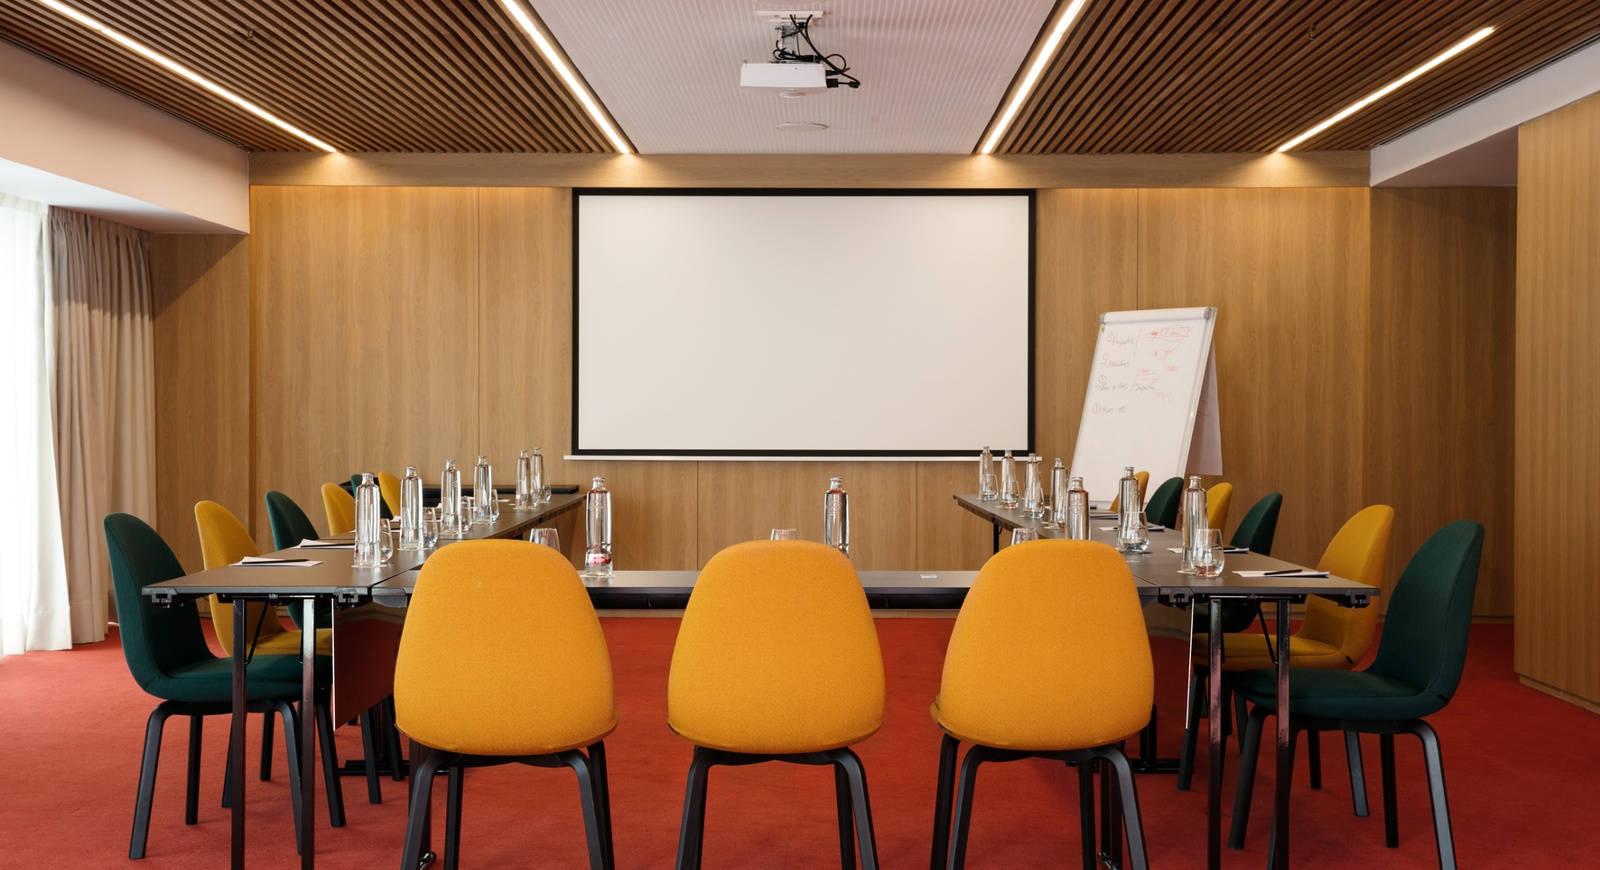 Detalle sala de reuniones hotel Barcelo